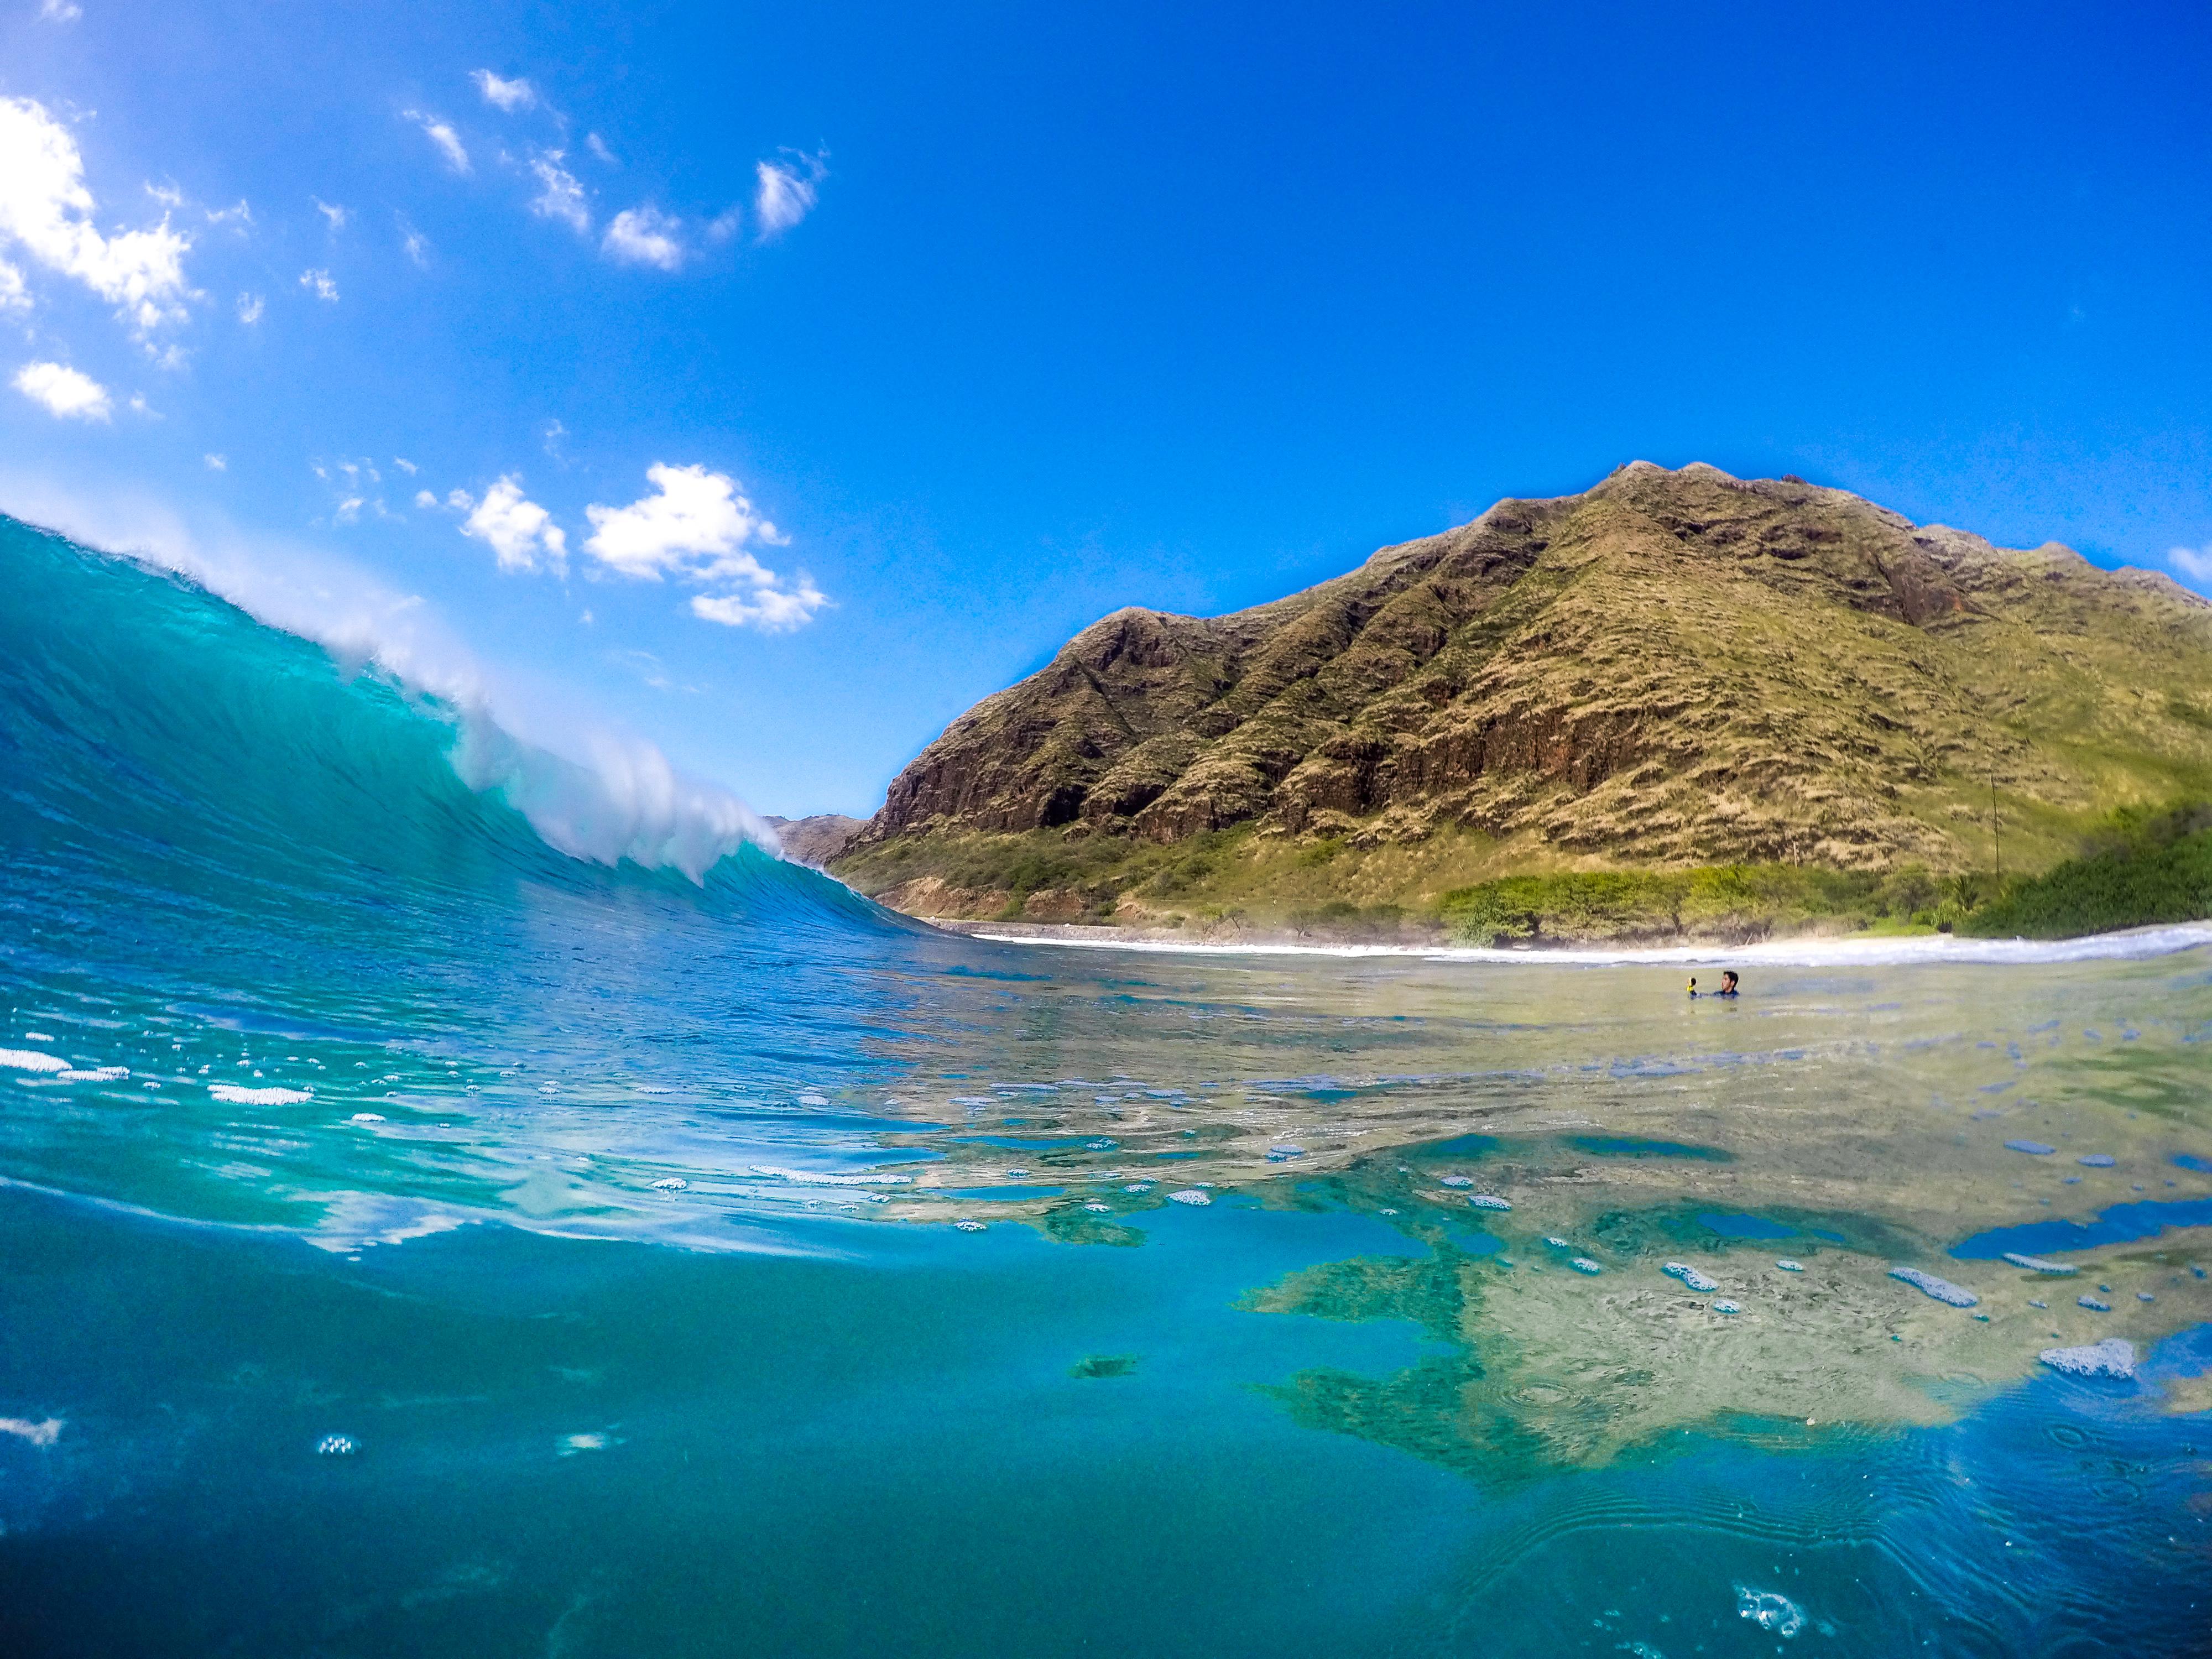 TOP 11 WEST OAHU BEACHES, HAWAII